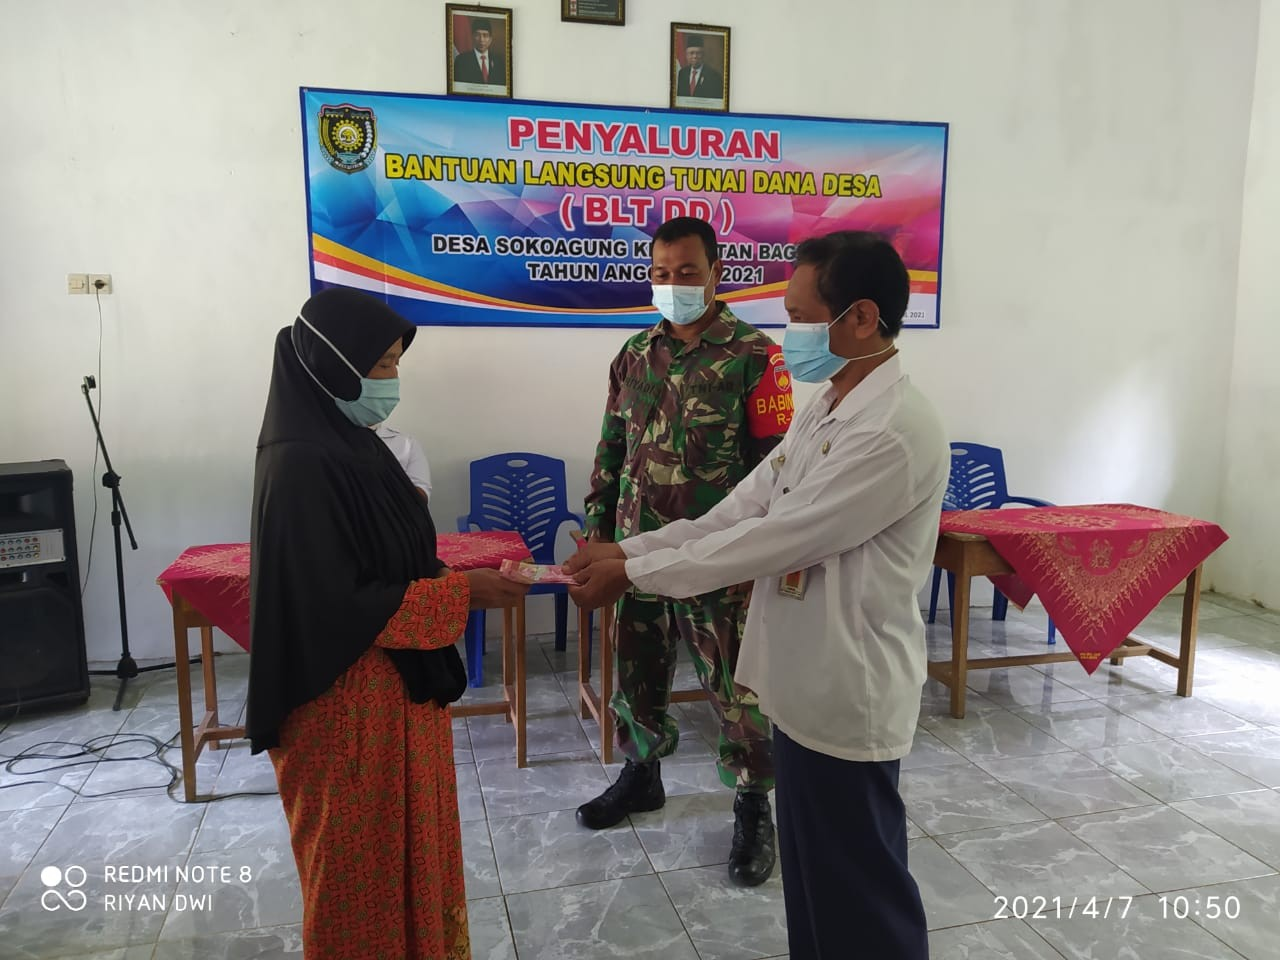 Penyaluran BLT DD Desa Sokoagung